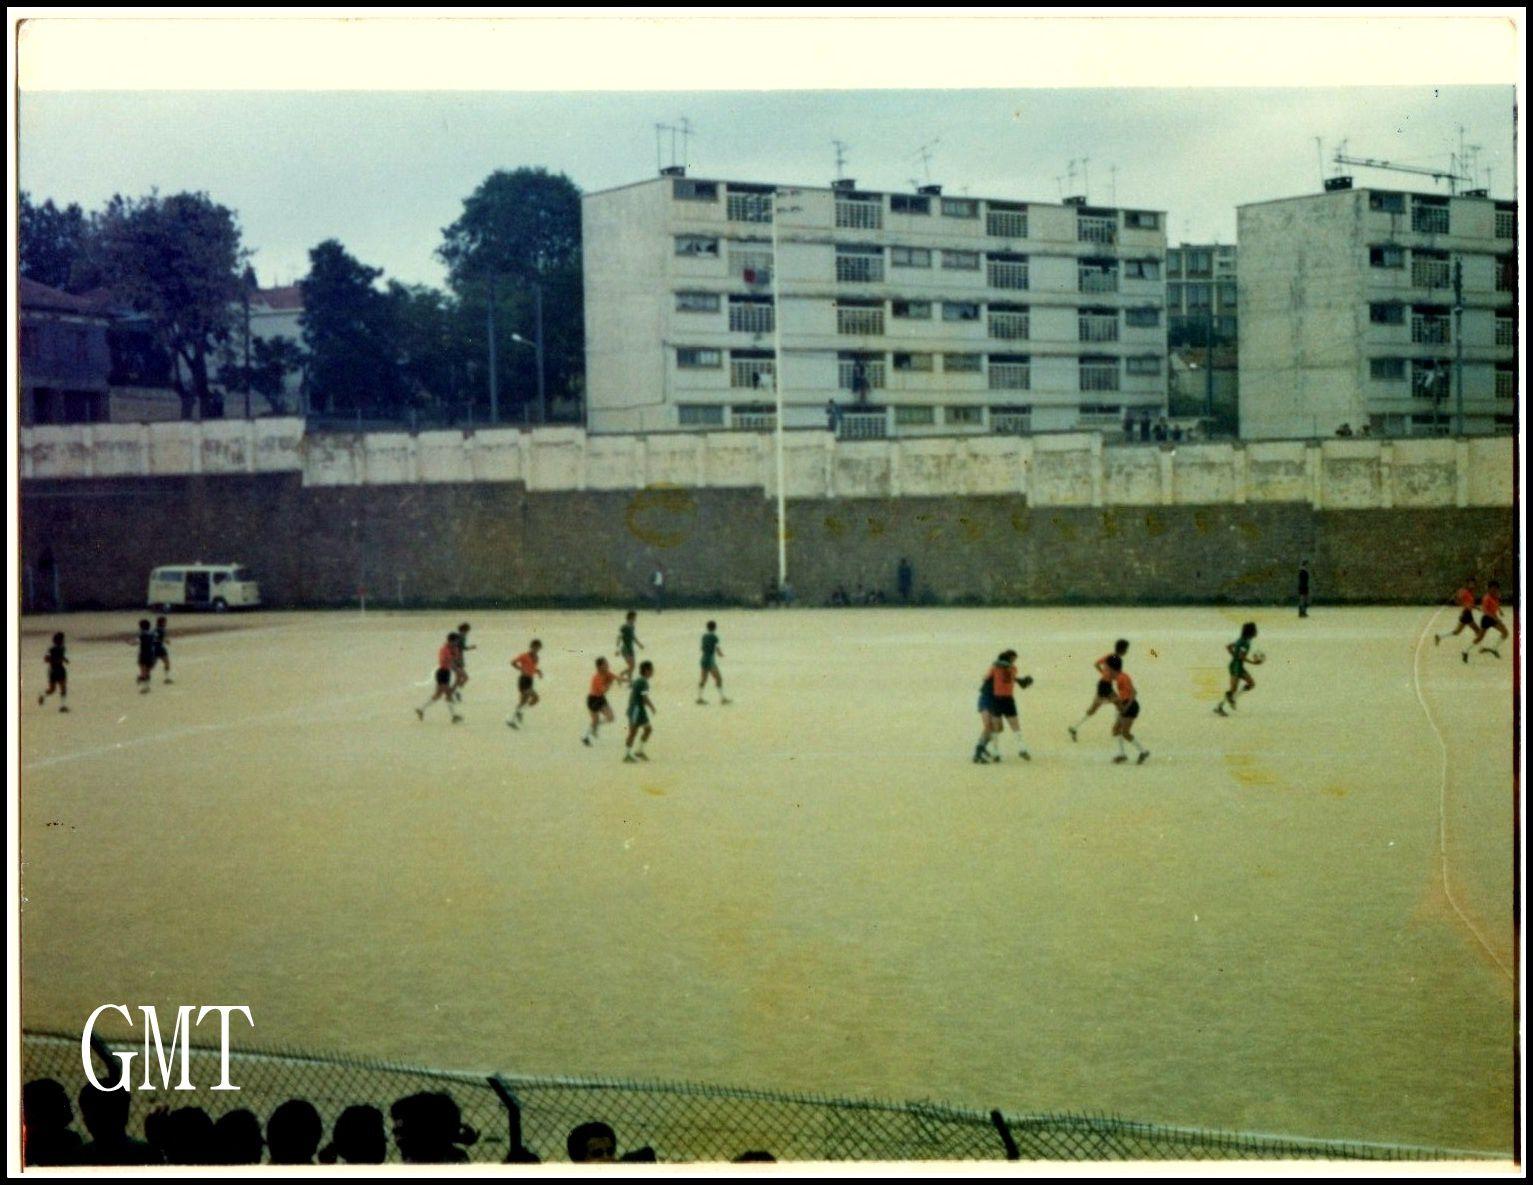 ACCESSION DU MBTABLAT - SOUVENIRS DU 25 MAI 1979